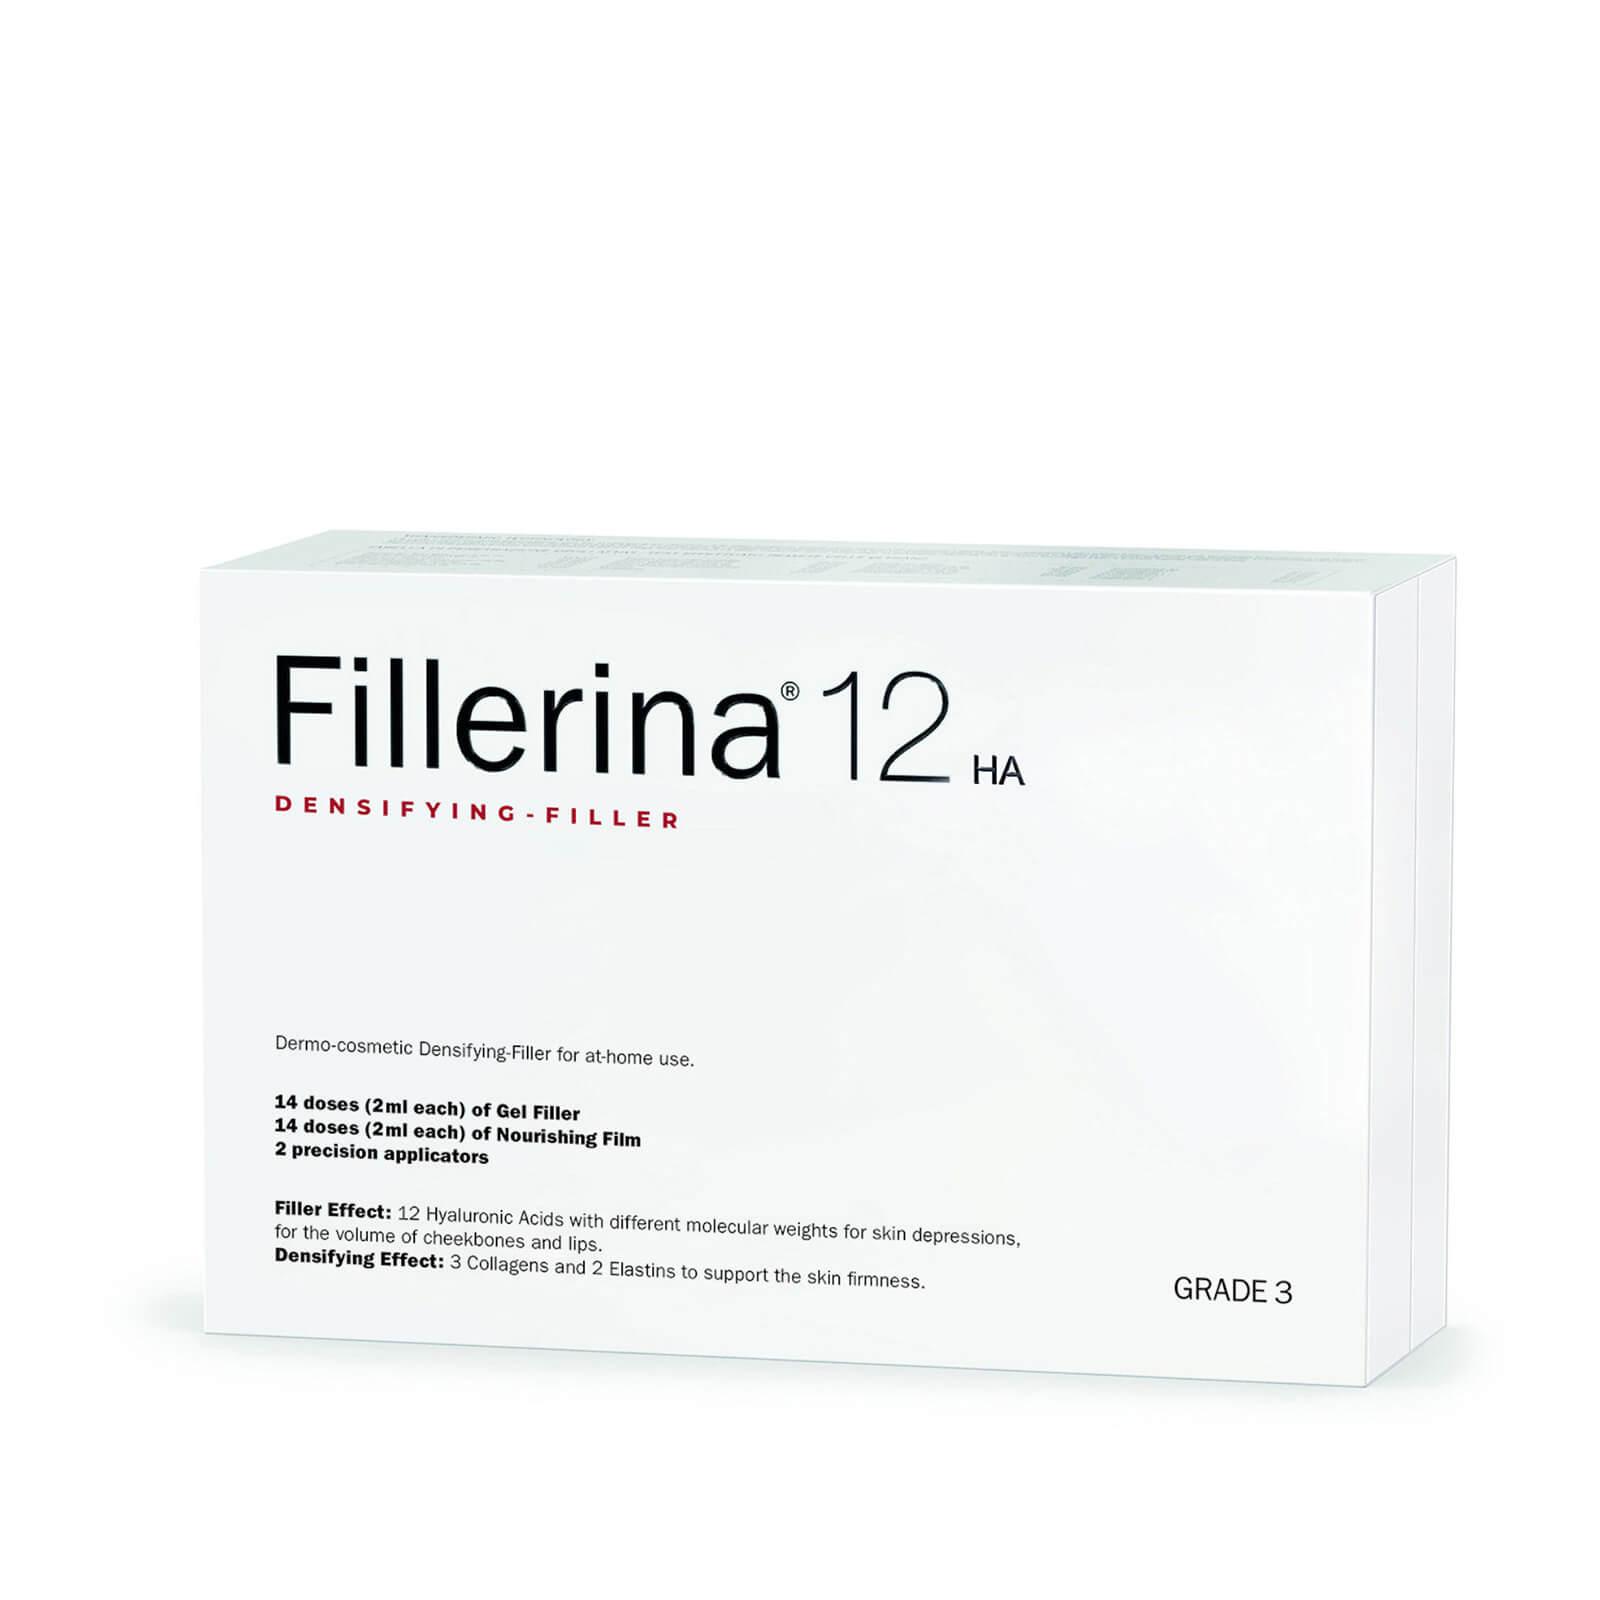 Image of Fillerina 12 Densifying-Filler Intensive Filler Treatment - Grade 3 2 x 30ml